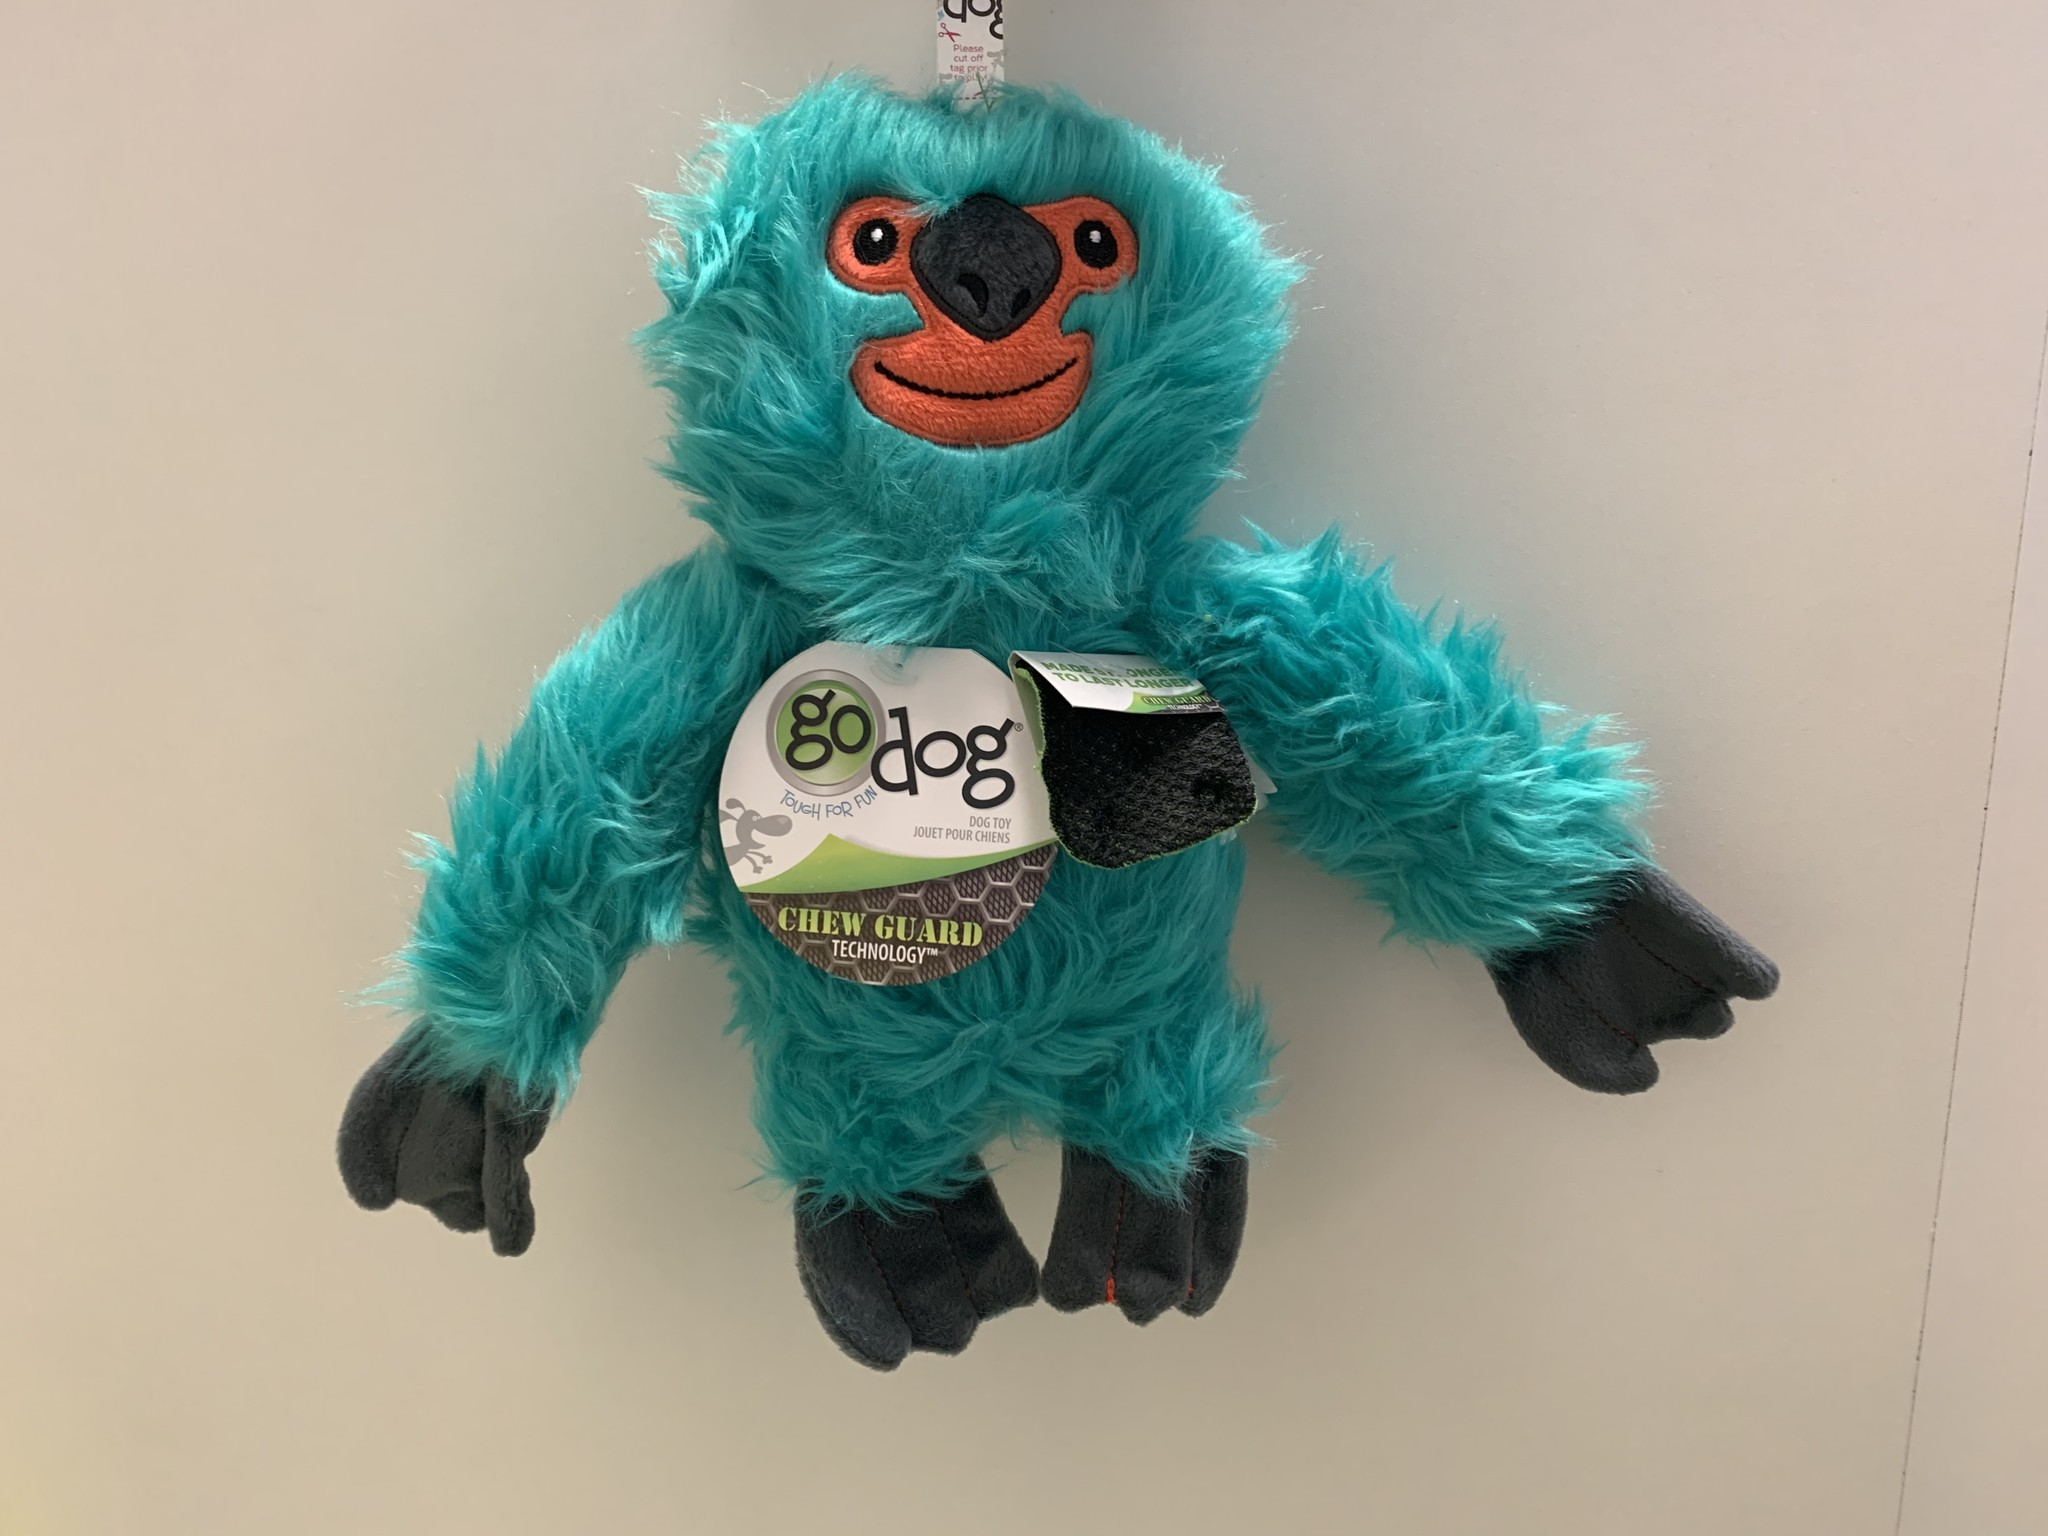 Go Dog Go Dog Fuzzy Sloth,Teal, Large